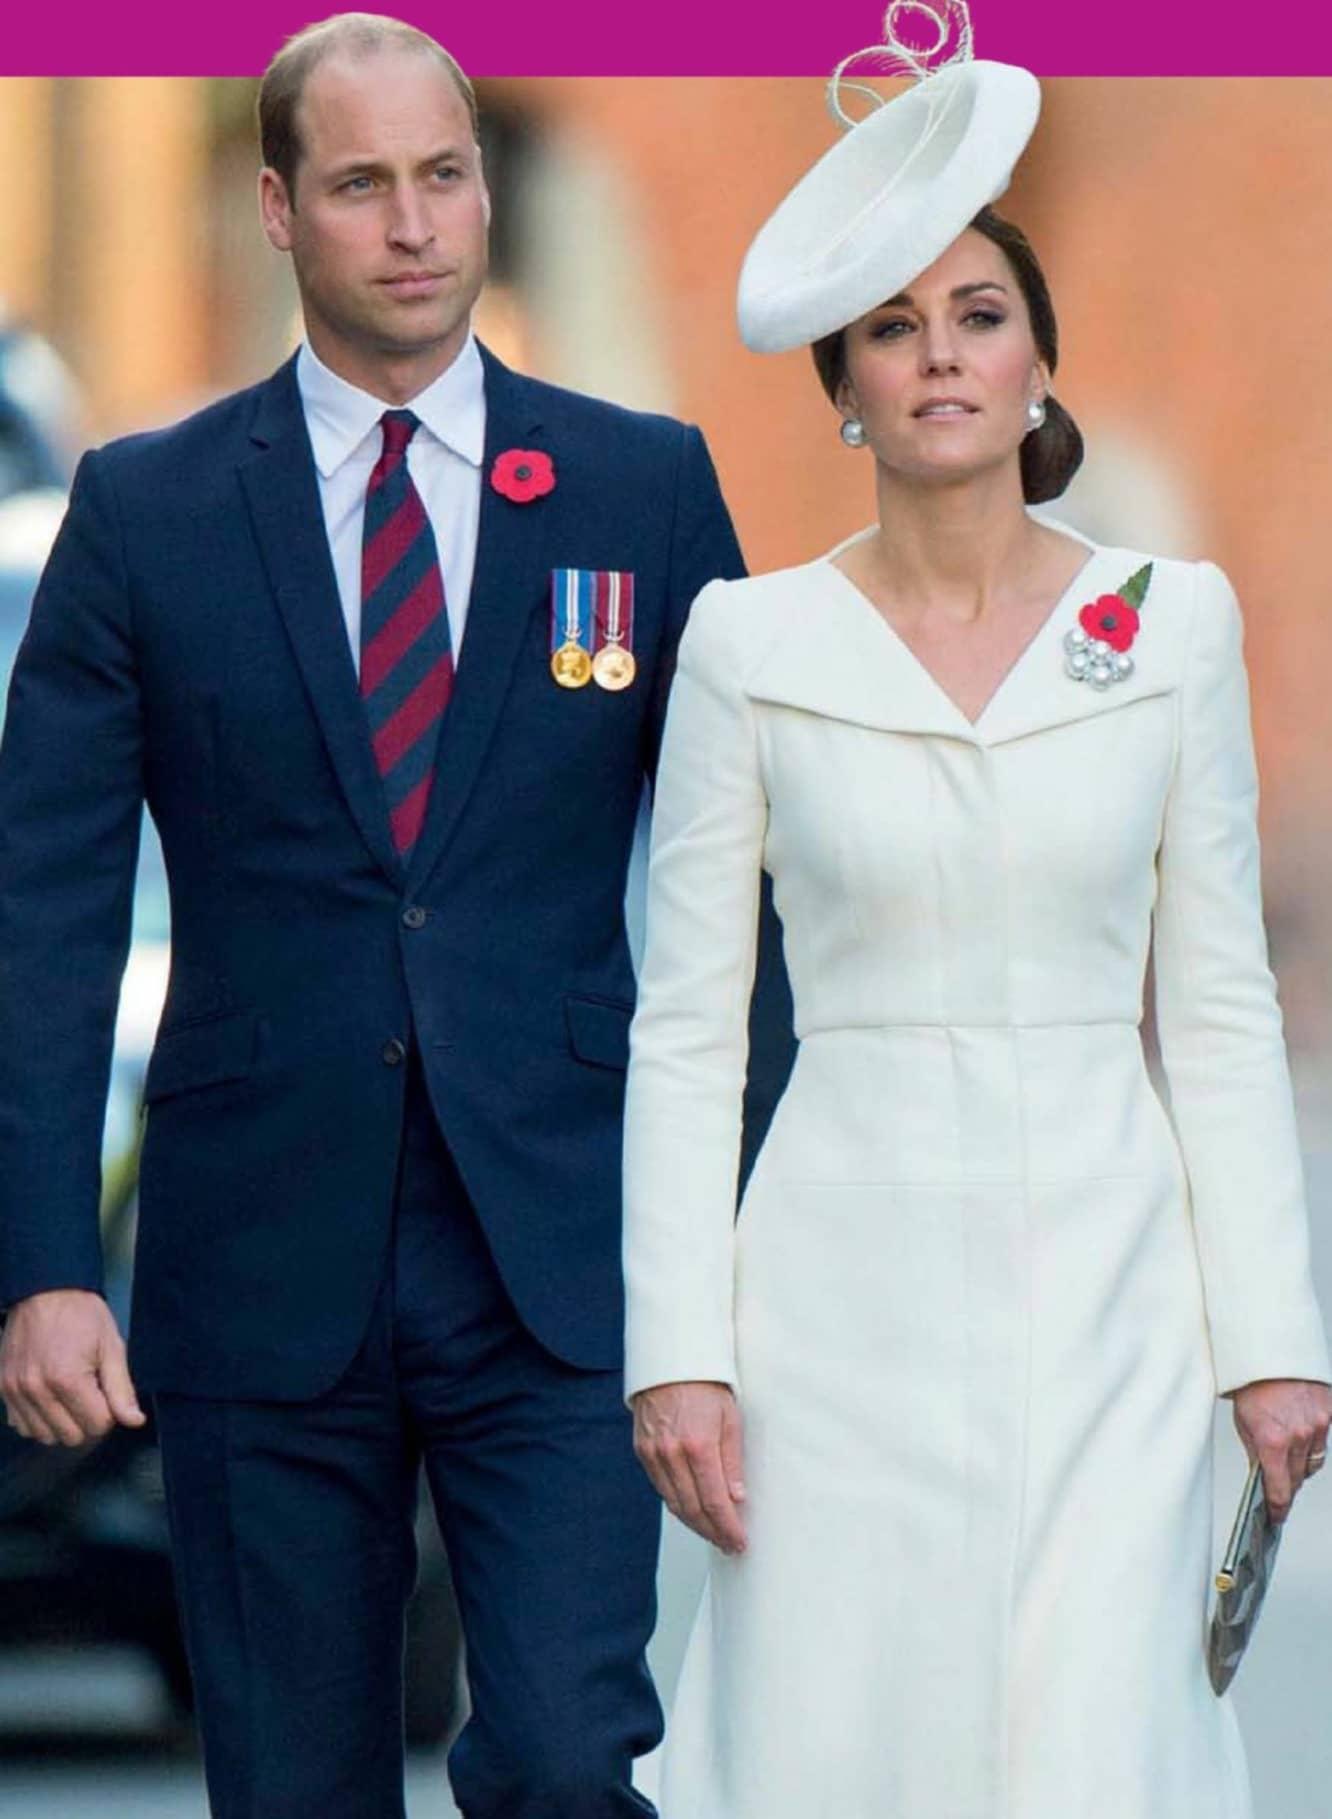 Will & Kate's First Days As De Facto King & Queen